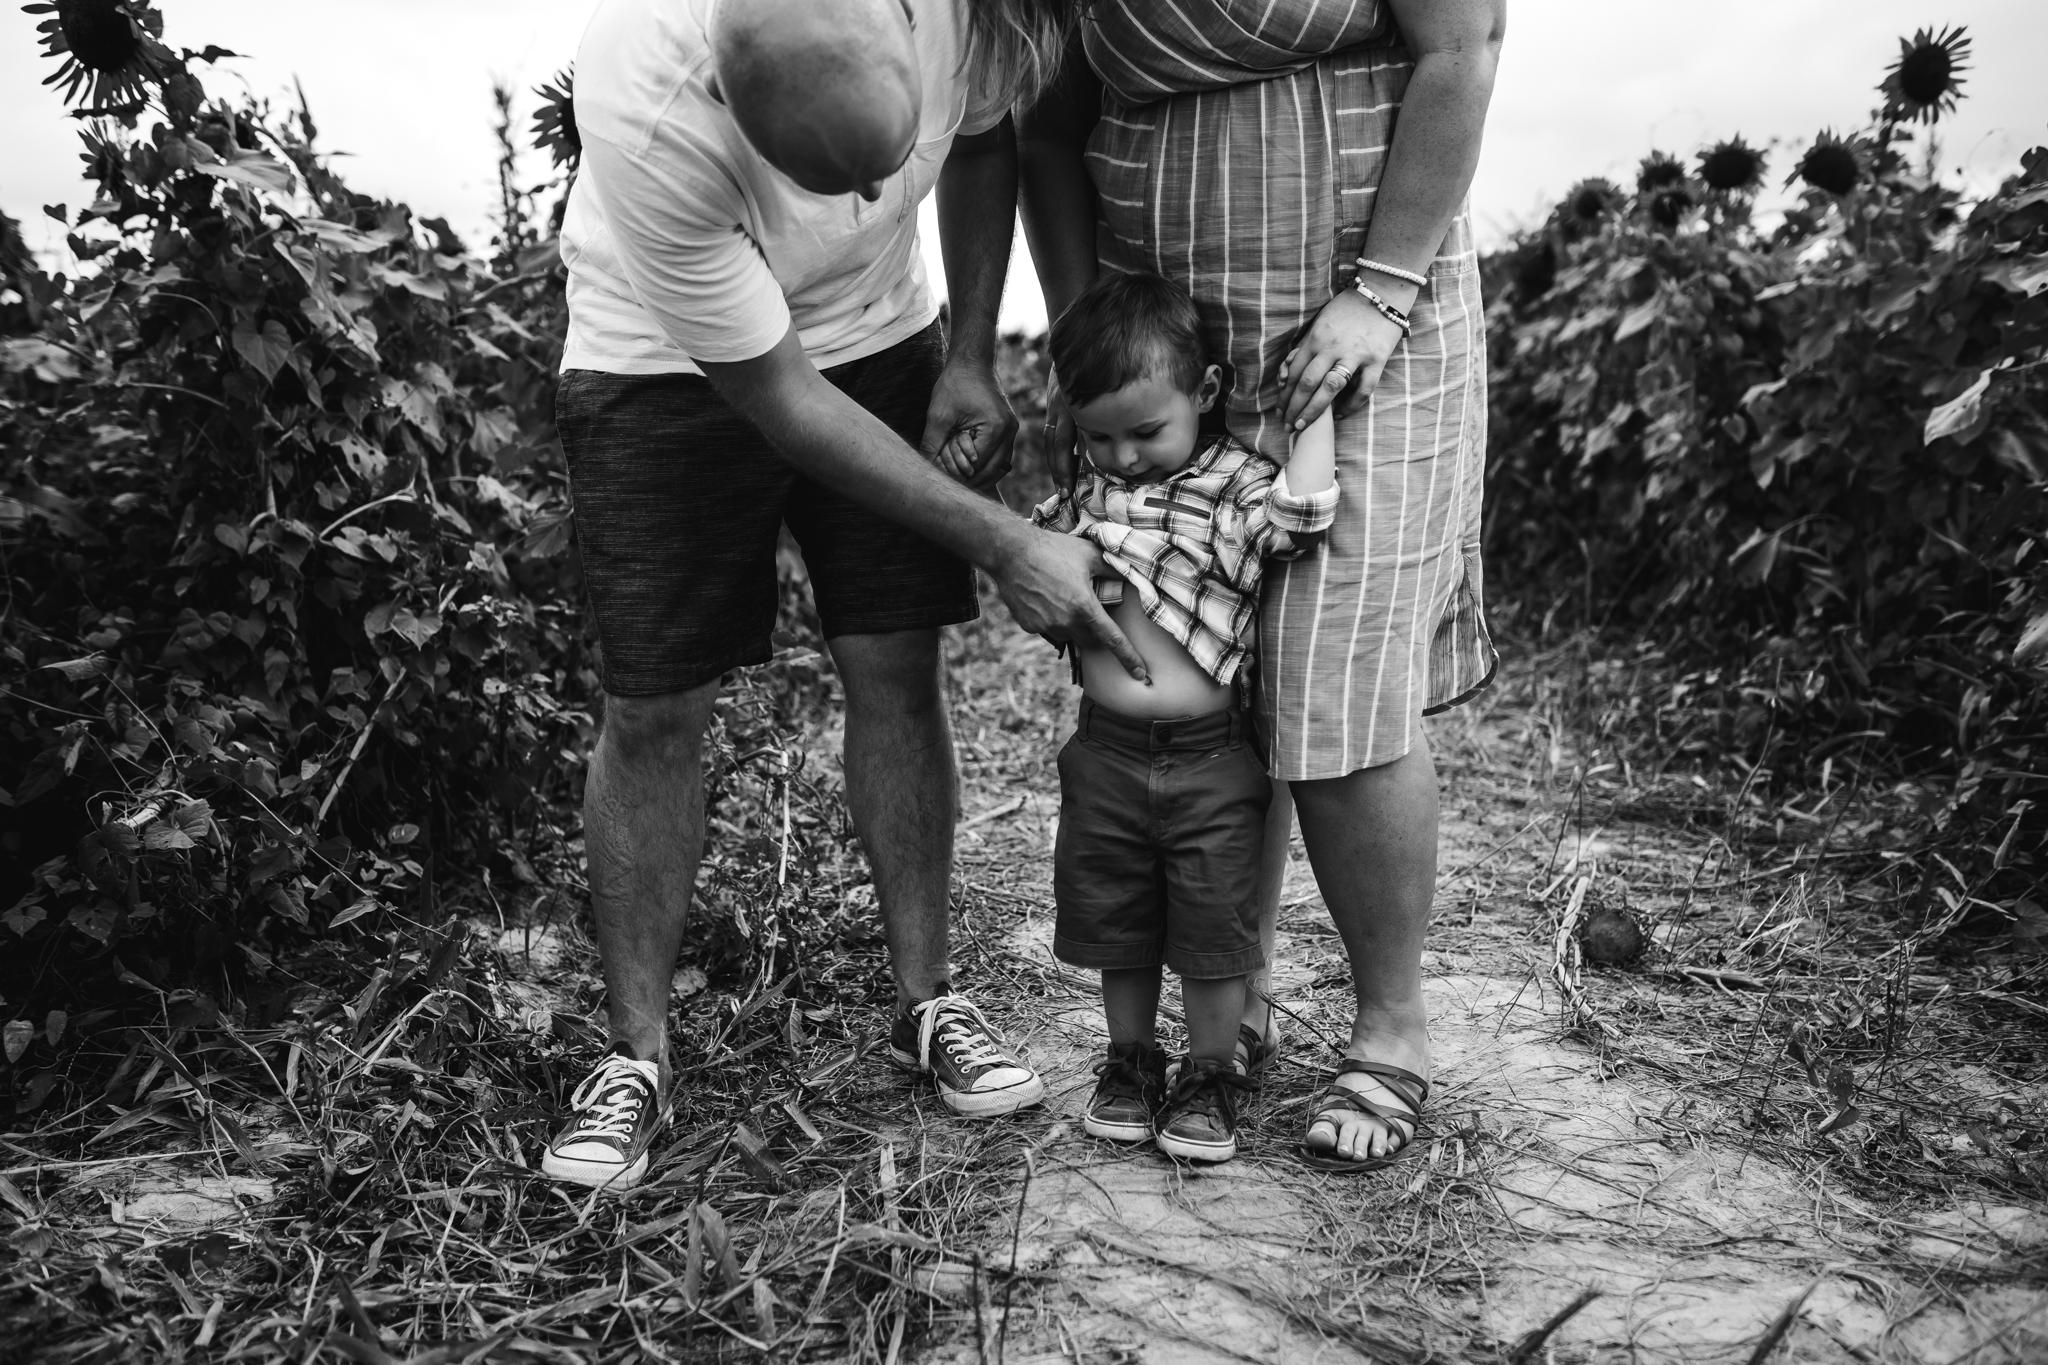 memphis-family-photographer-sunflower-thewarmtharoundyou (10 of 11).jpg